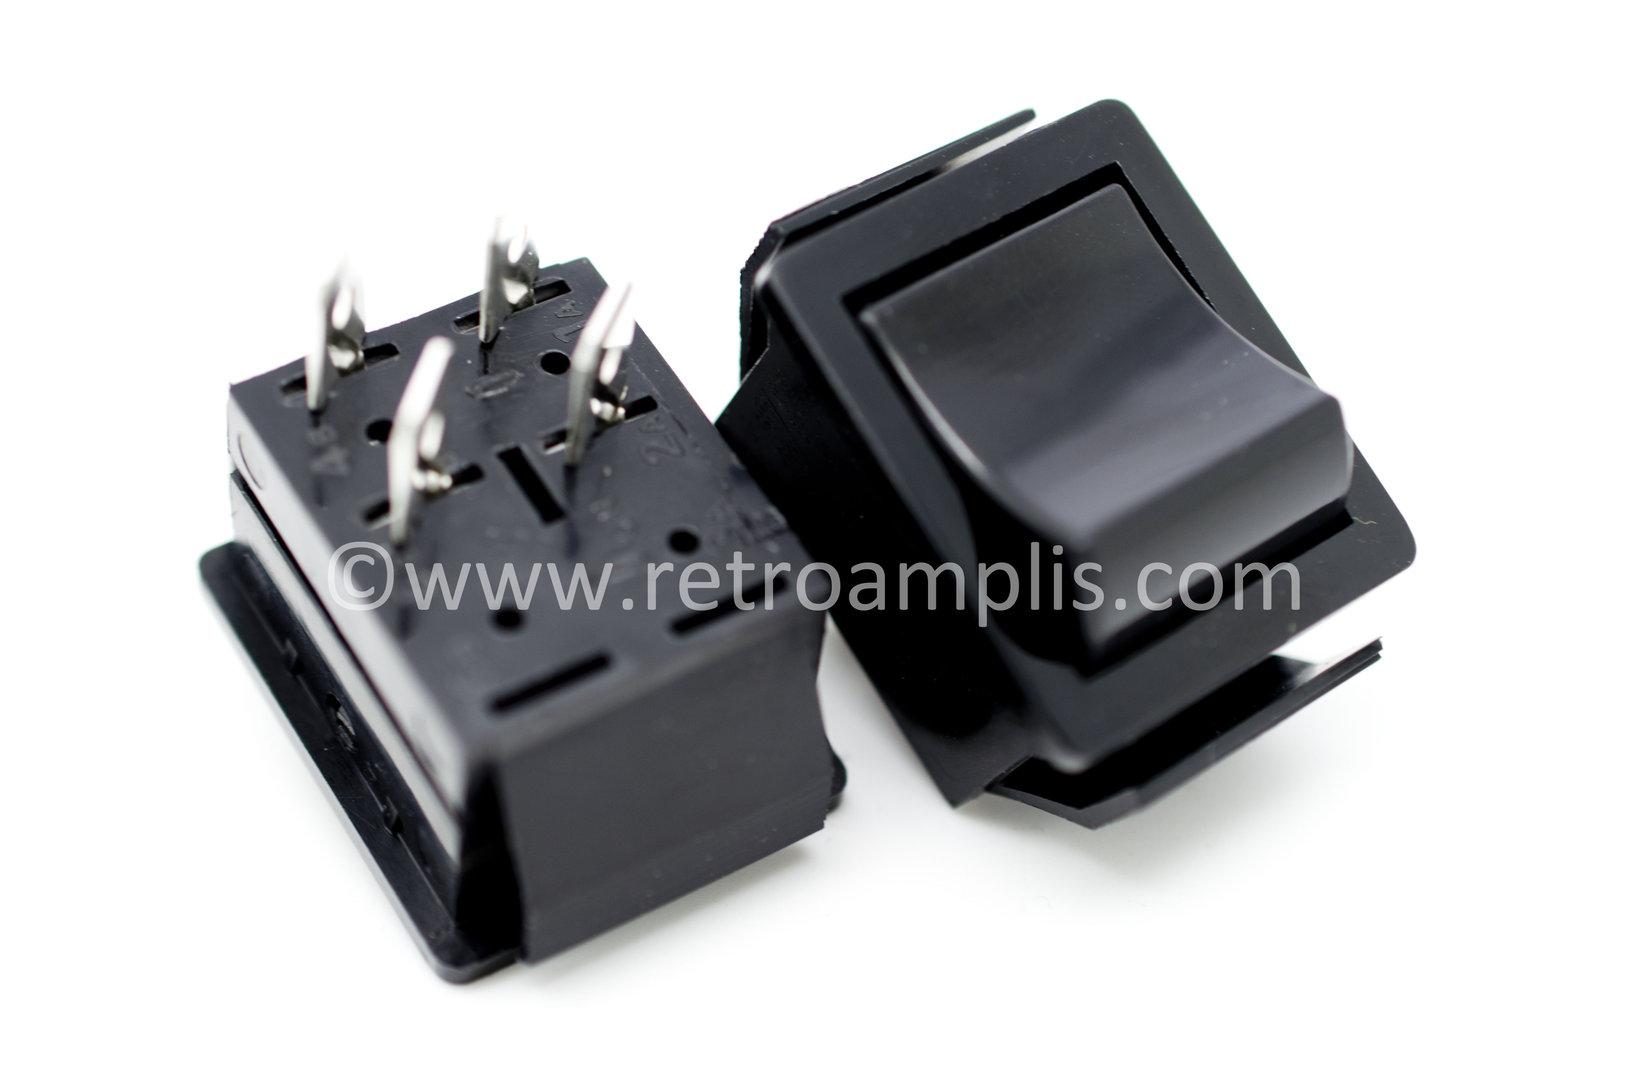 Marshall TSL Standby DPST switch, black - Retroamplis